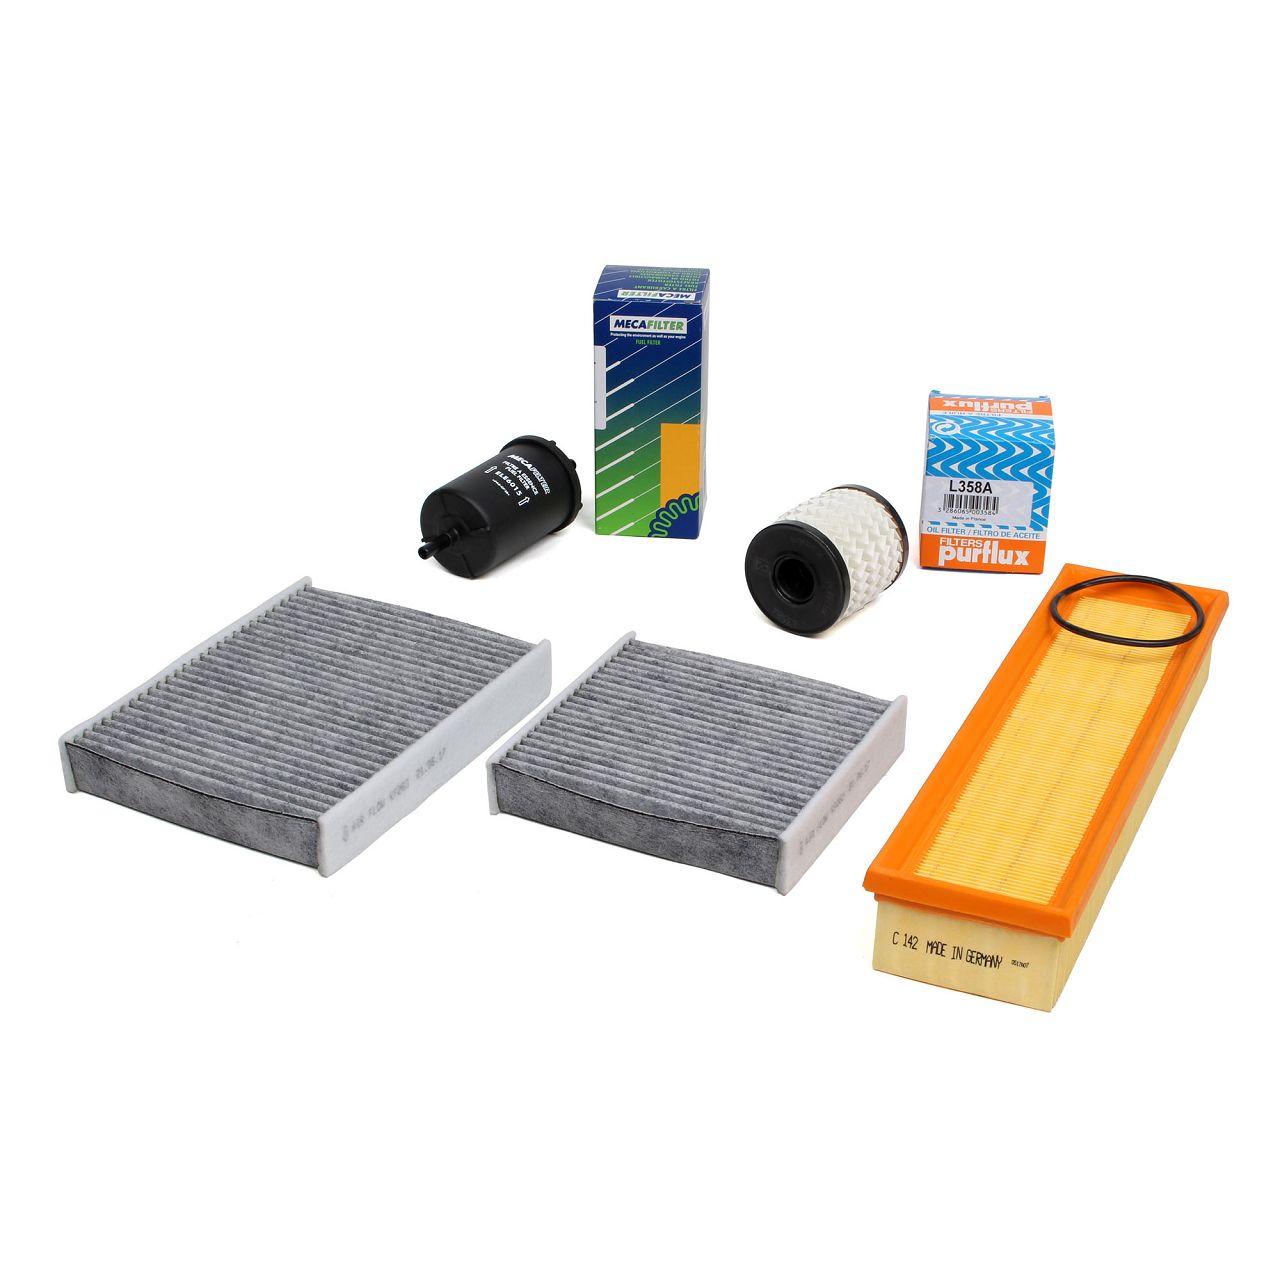 Inspektionskit Filterpaket Filterset für PEUGEOT 207 + 207 SW 1.4 73 PS